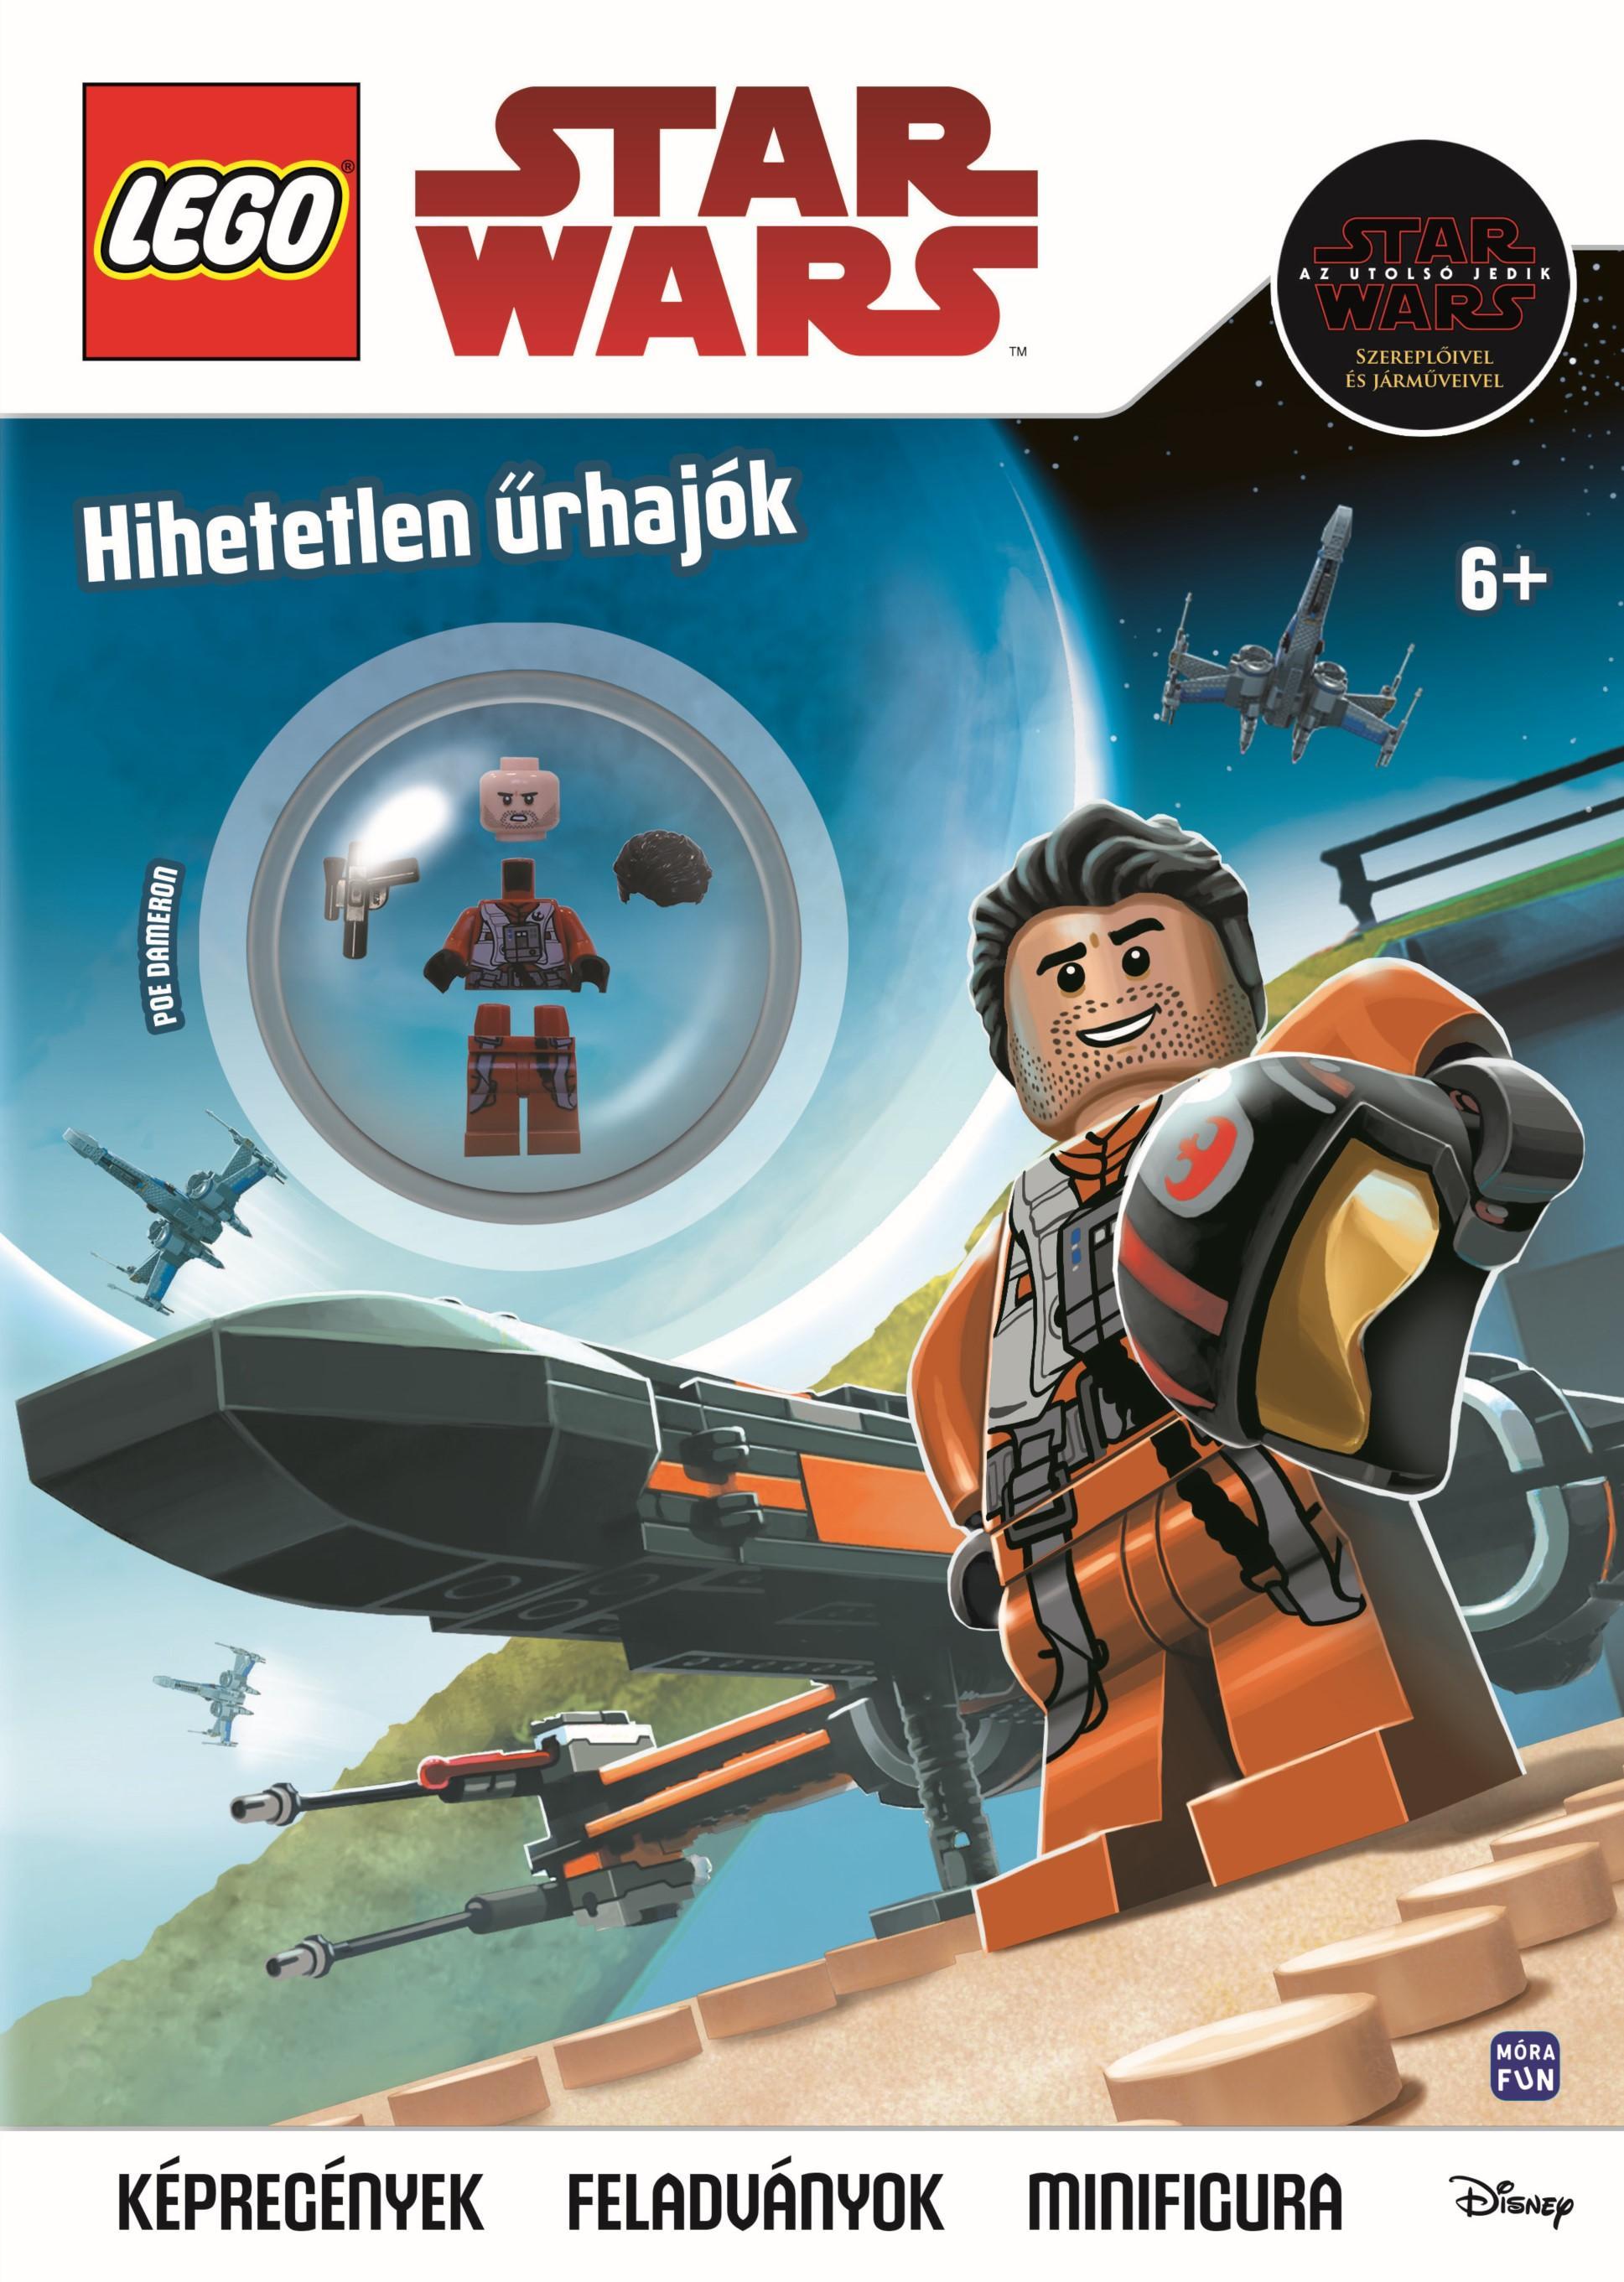 LEGO STAR WARS - HIHETETLEN ÛRHAJÓK